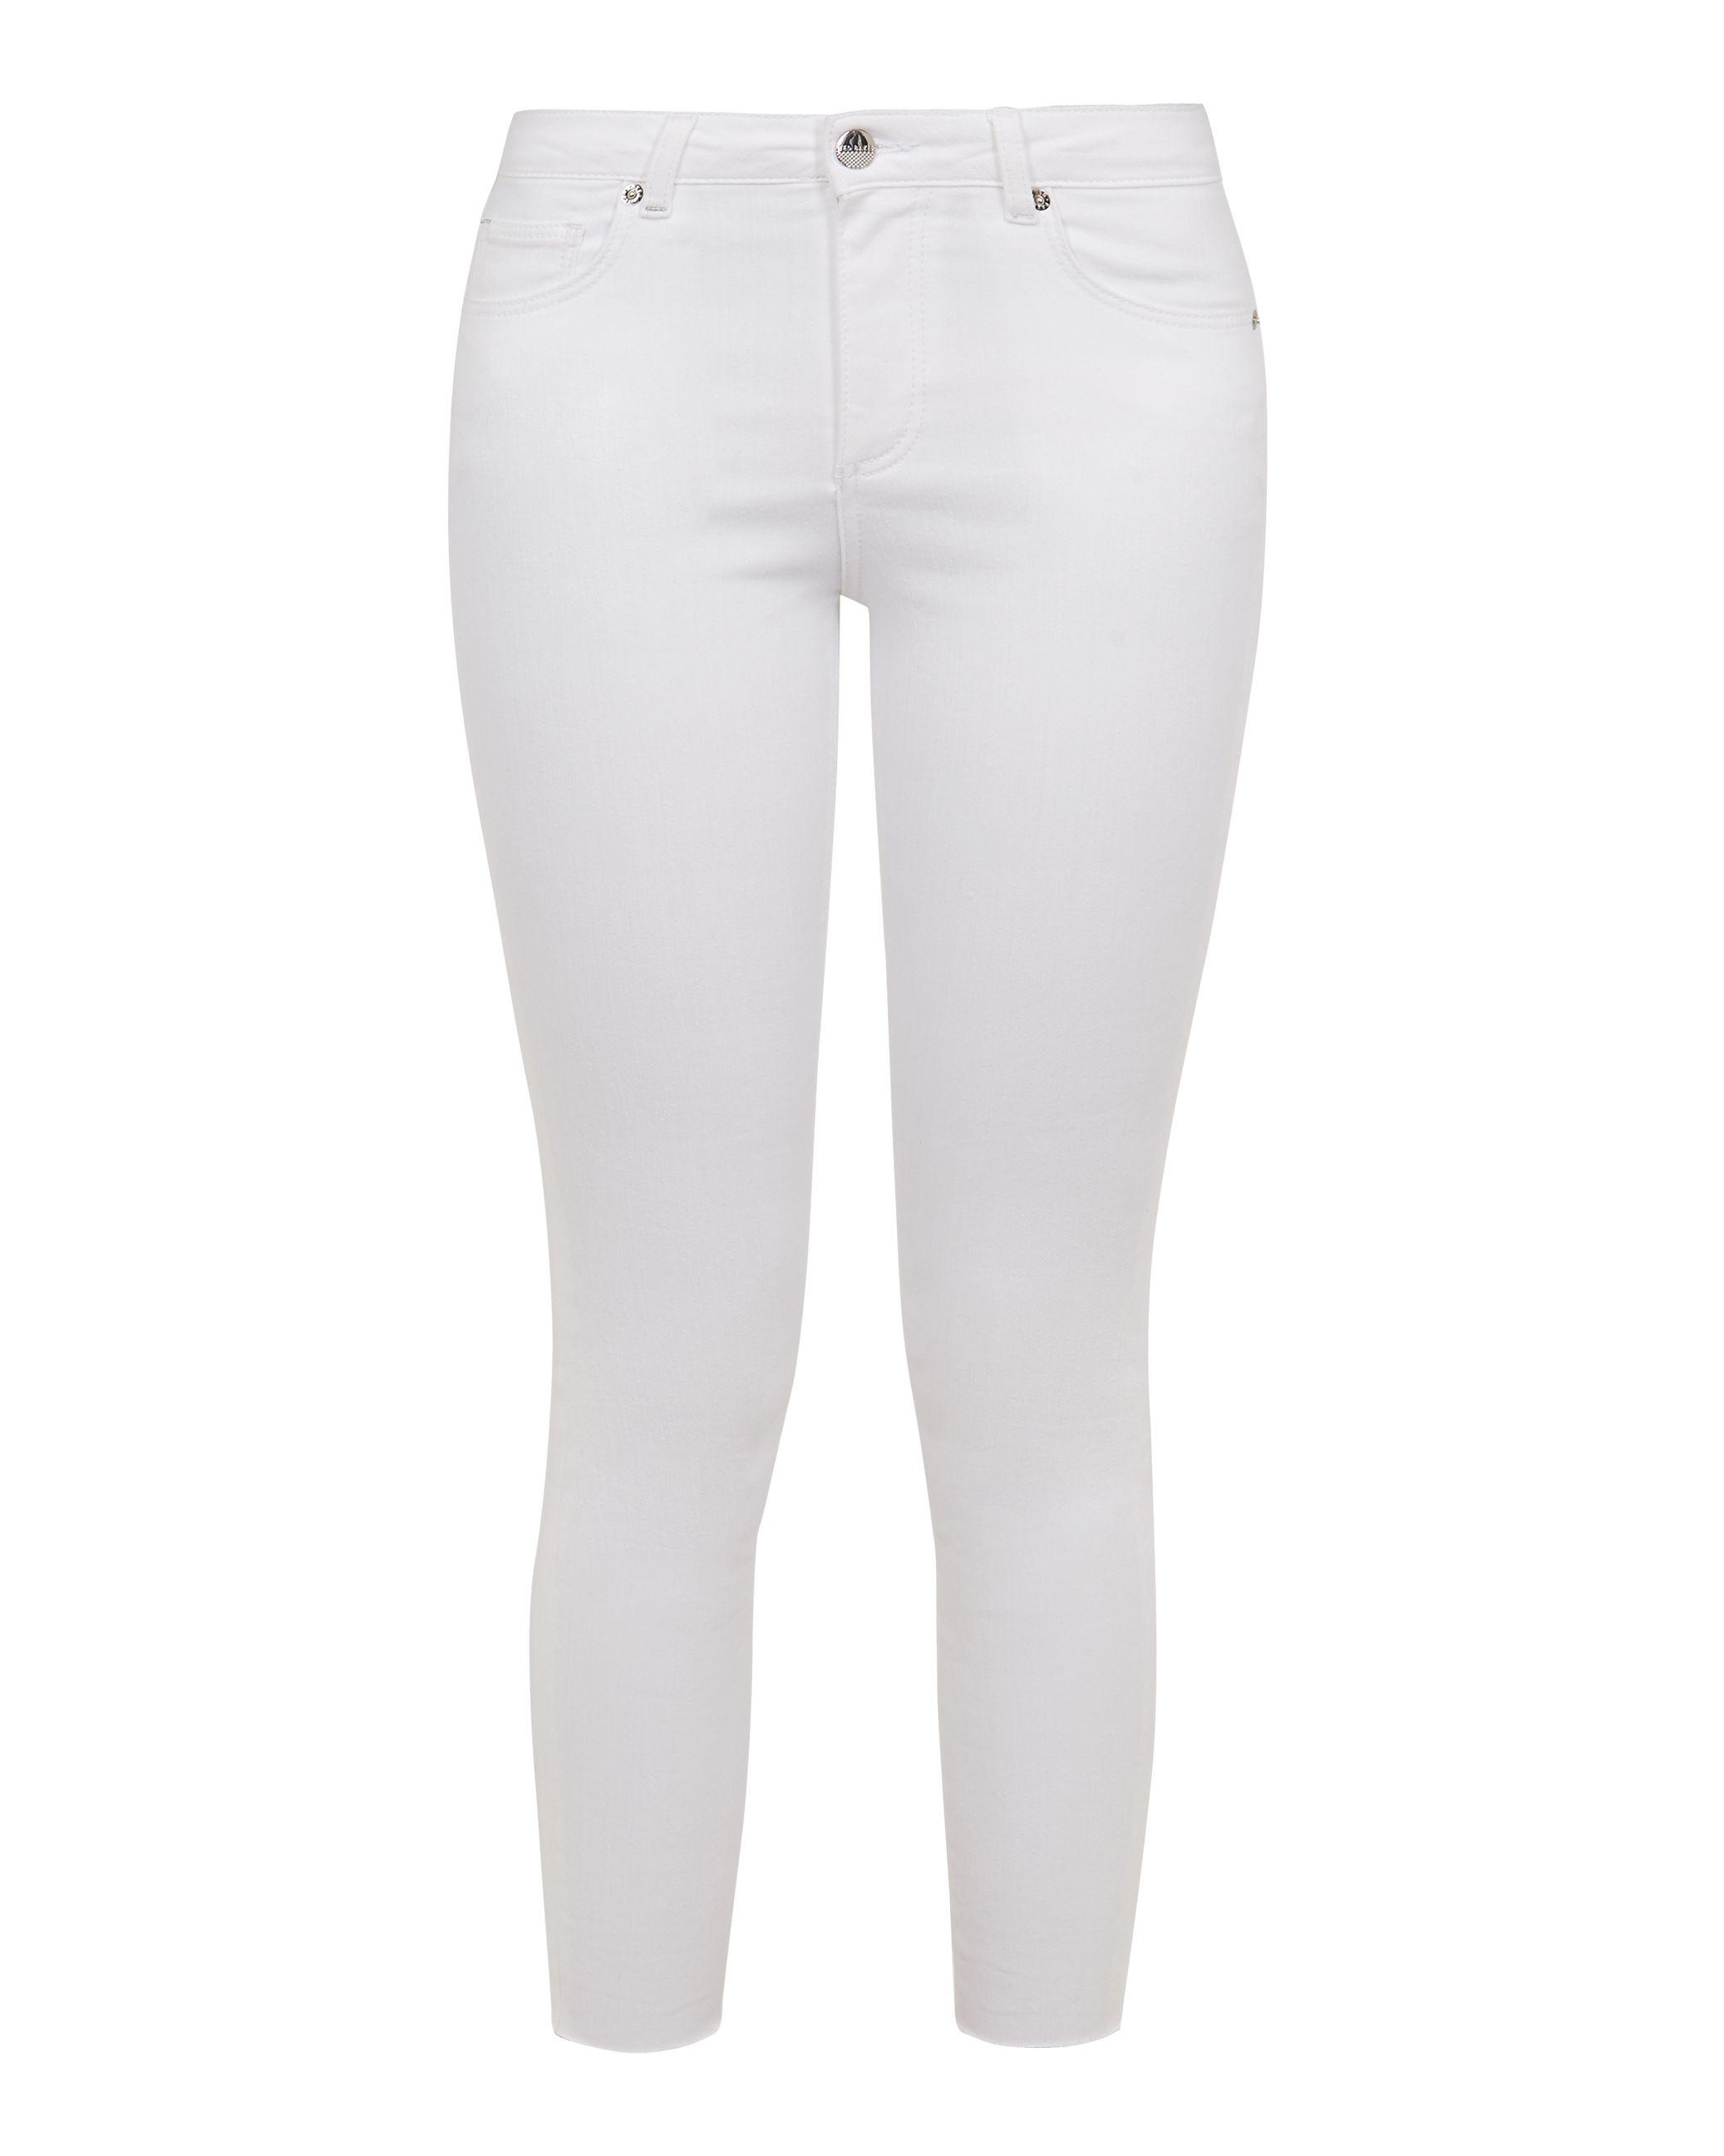 Ted Baker Catarsi Uneven Raw Hem Skinny Jeans, White